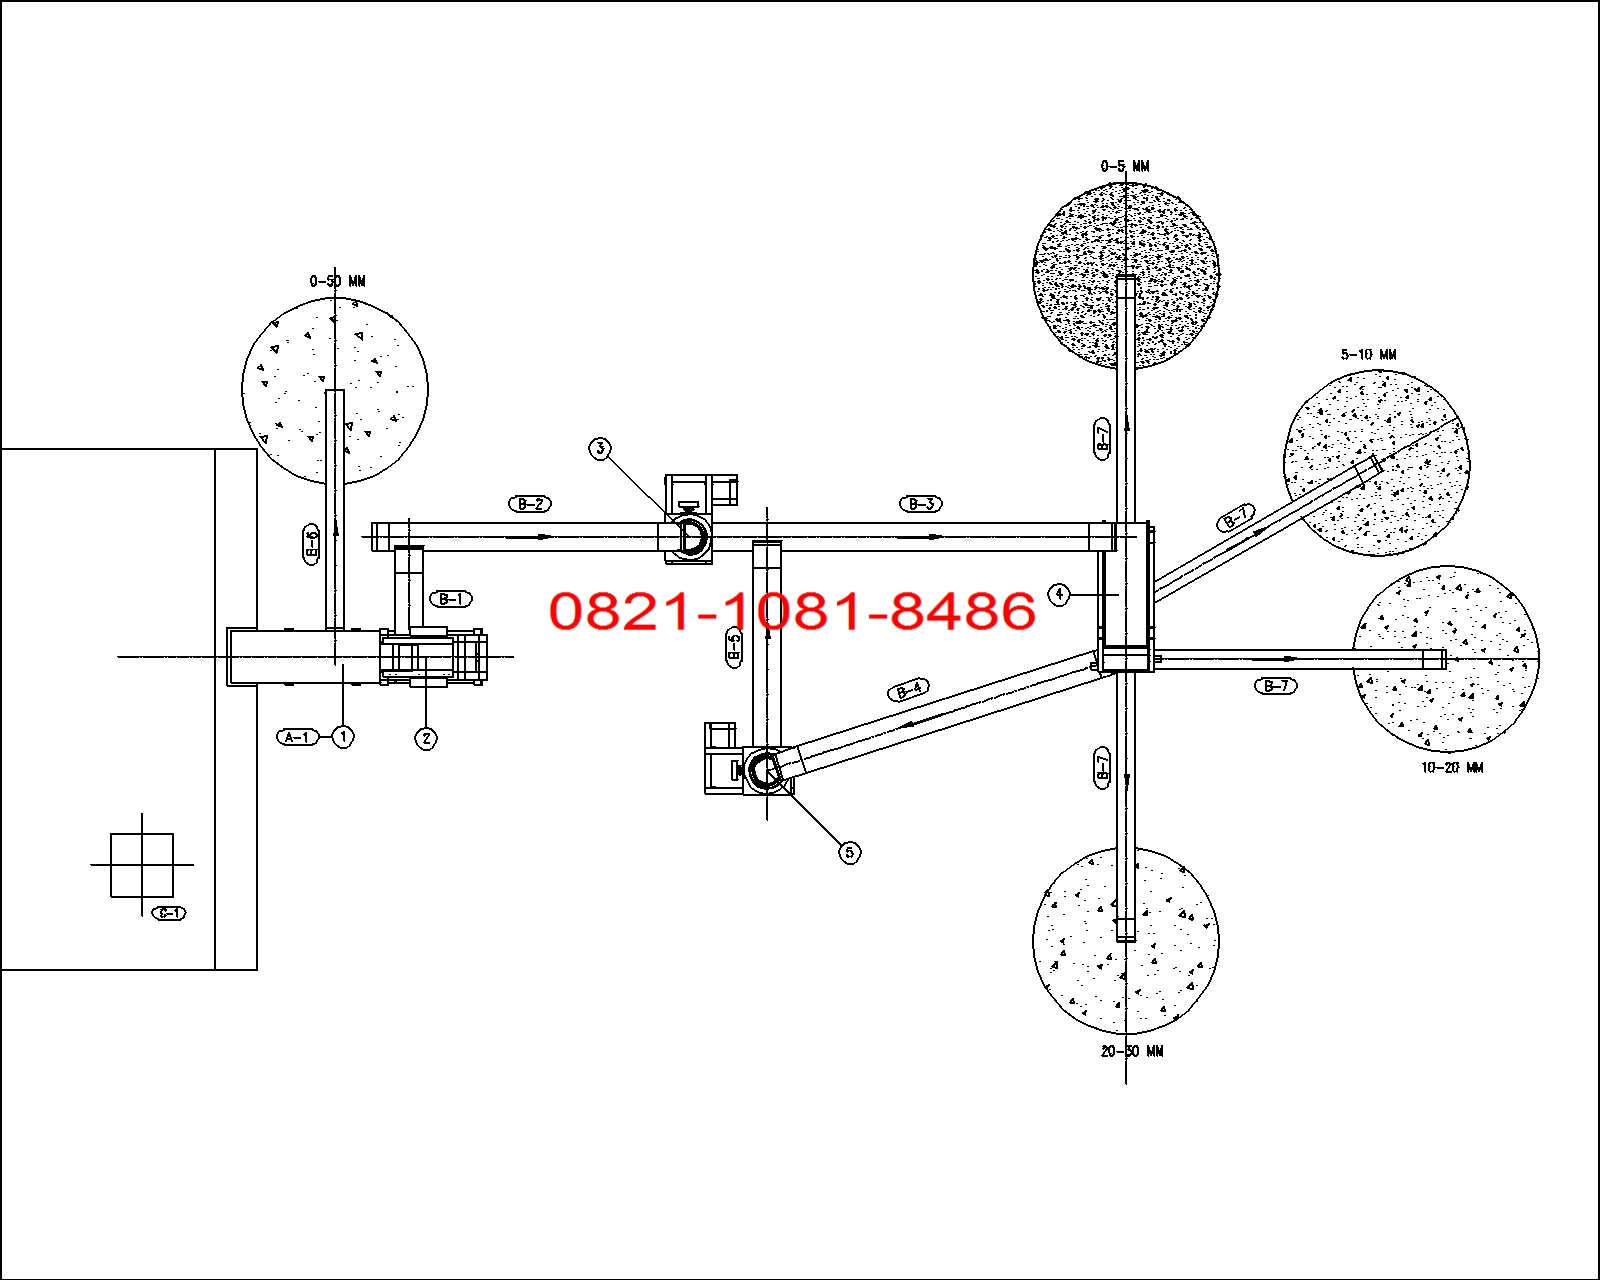 jaw crusher diagram wiring diagram schematic